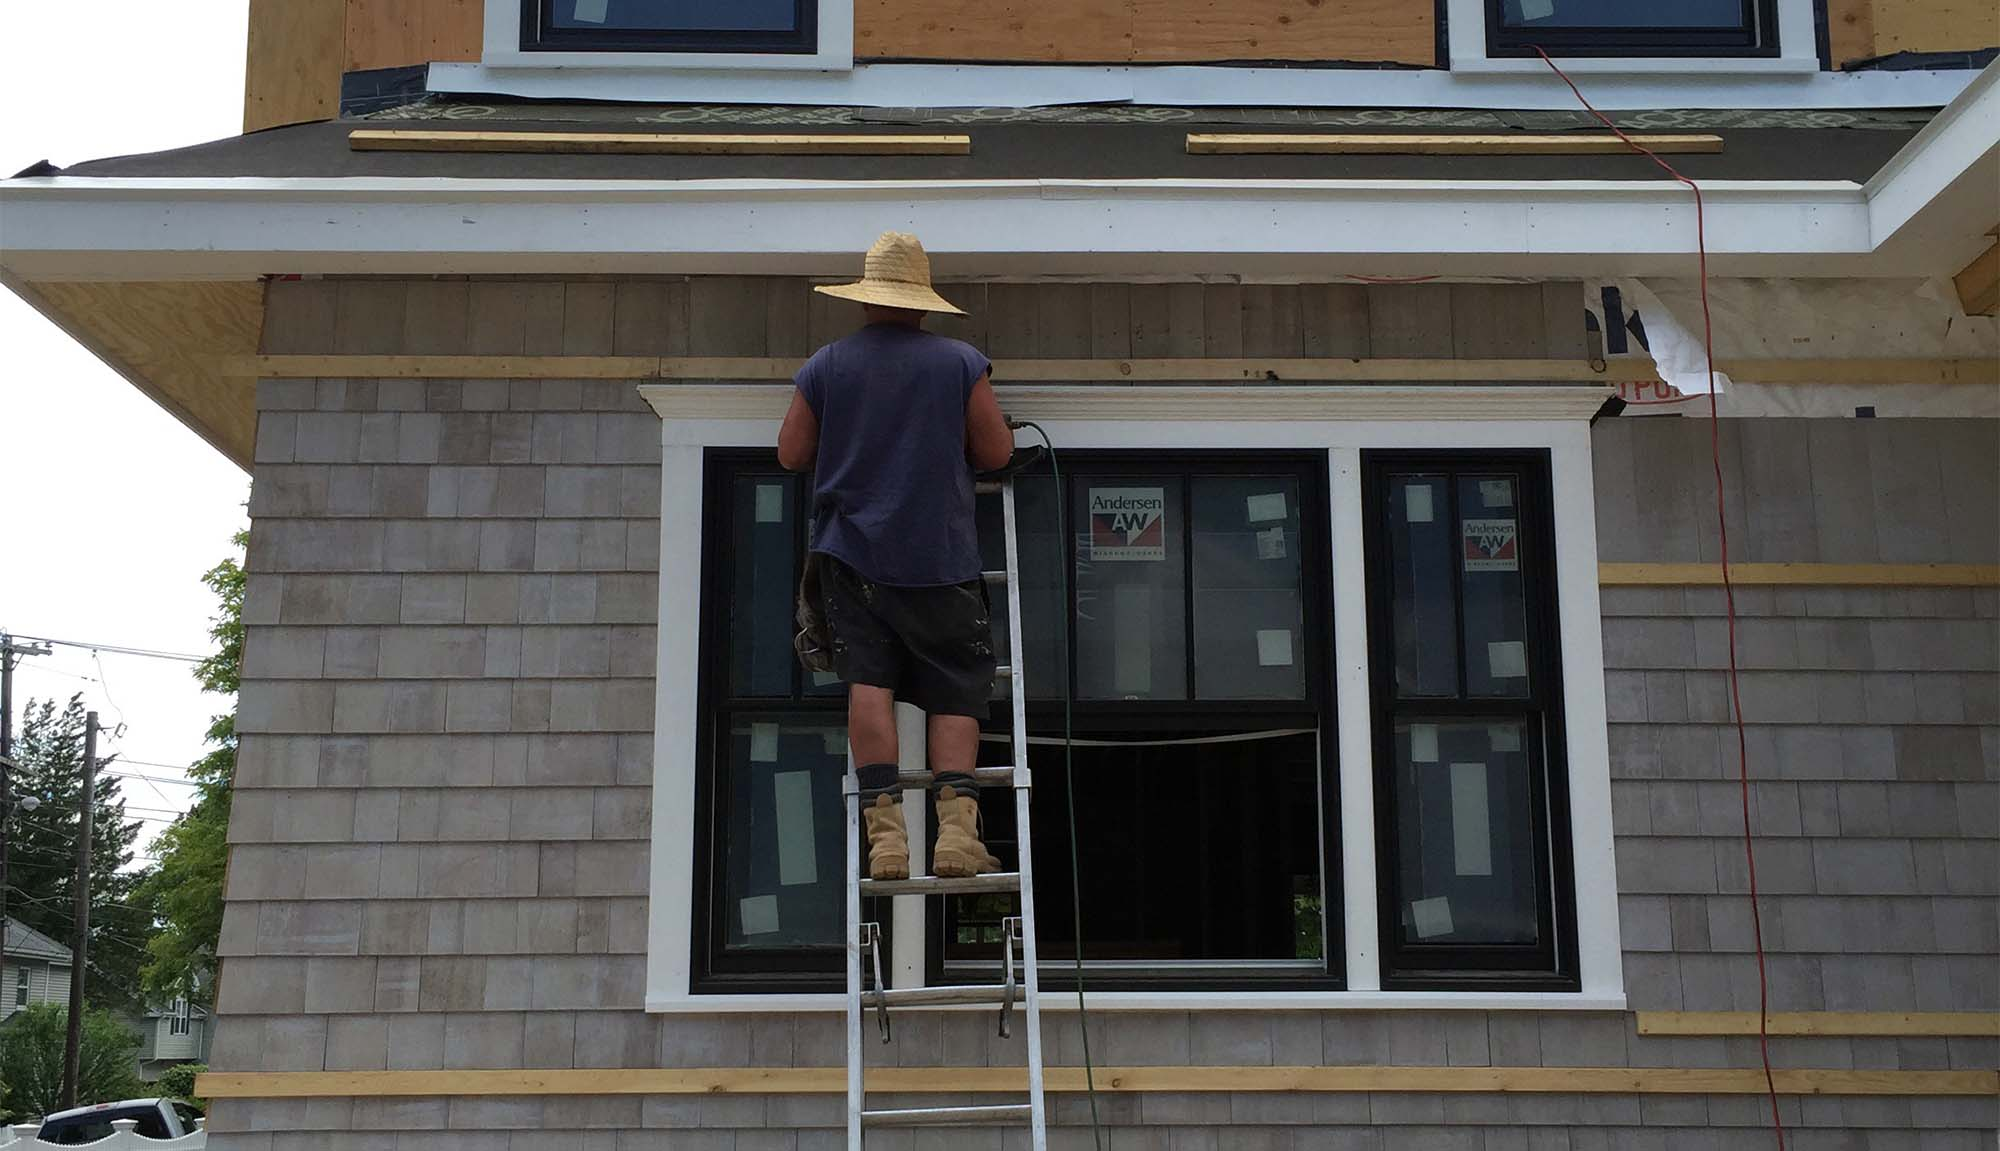 direct cedar shingle siding installation white cedar shingles black frame anderen windows white azek trim